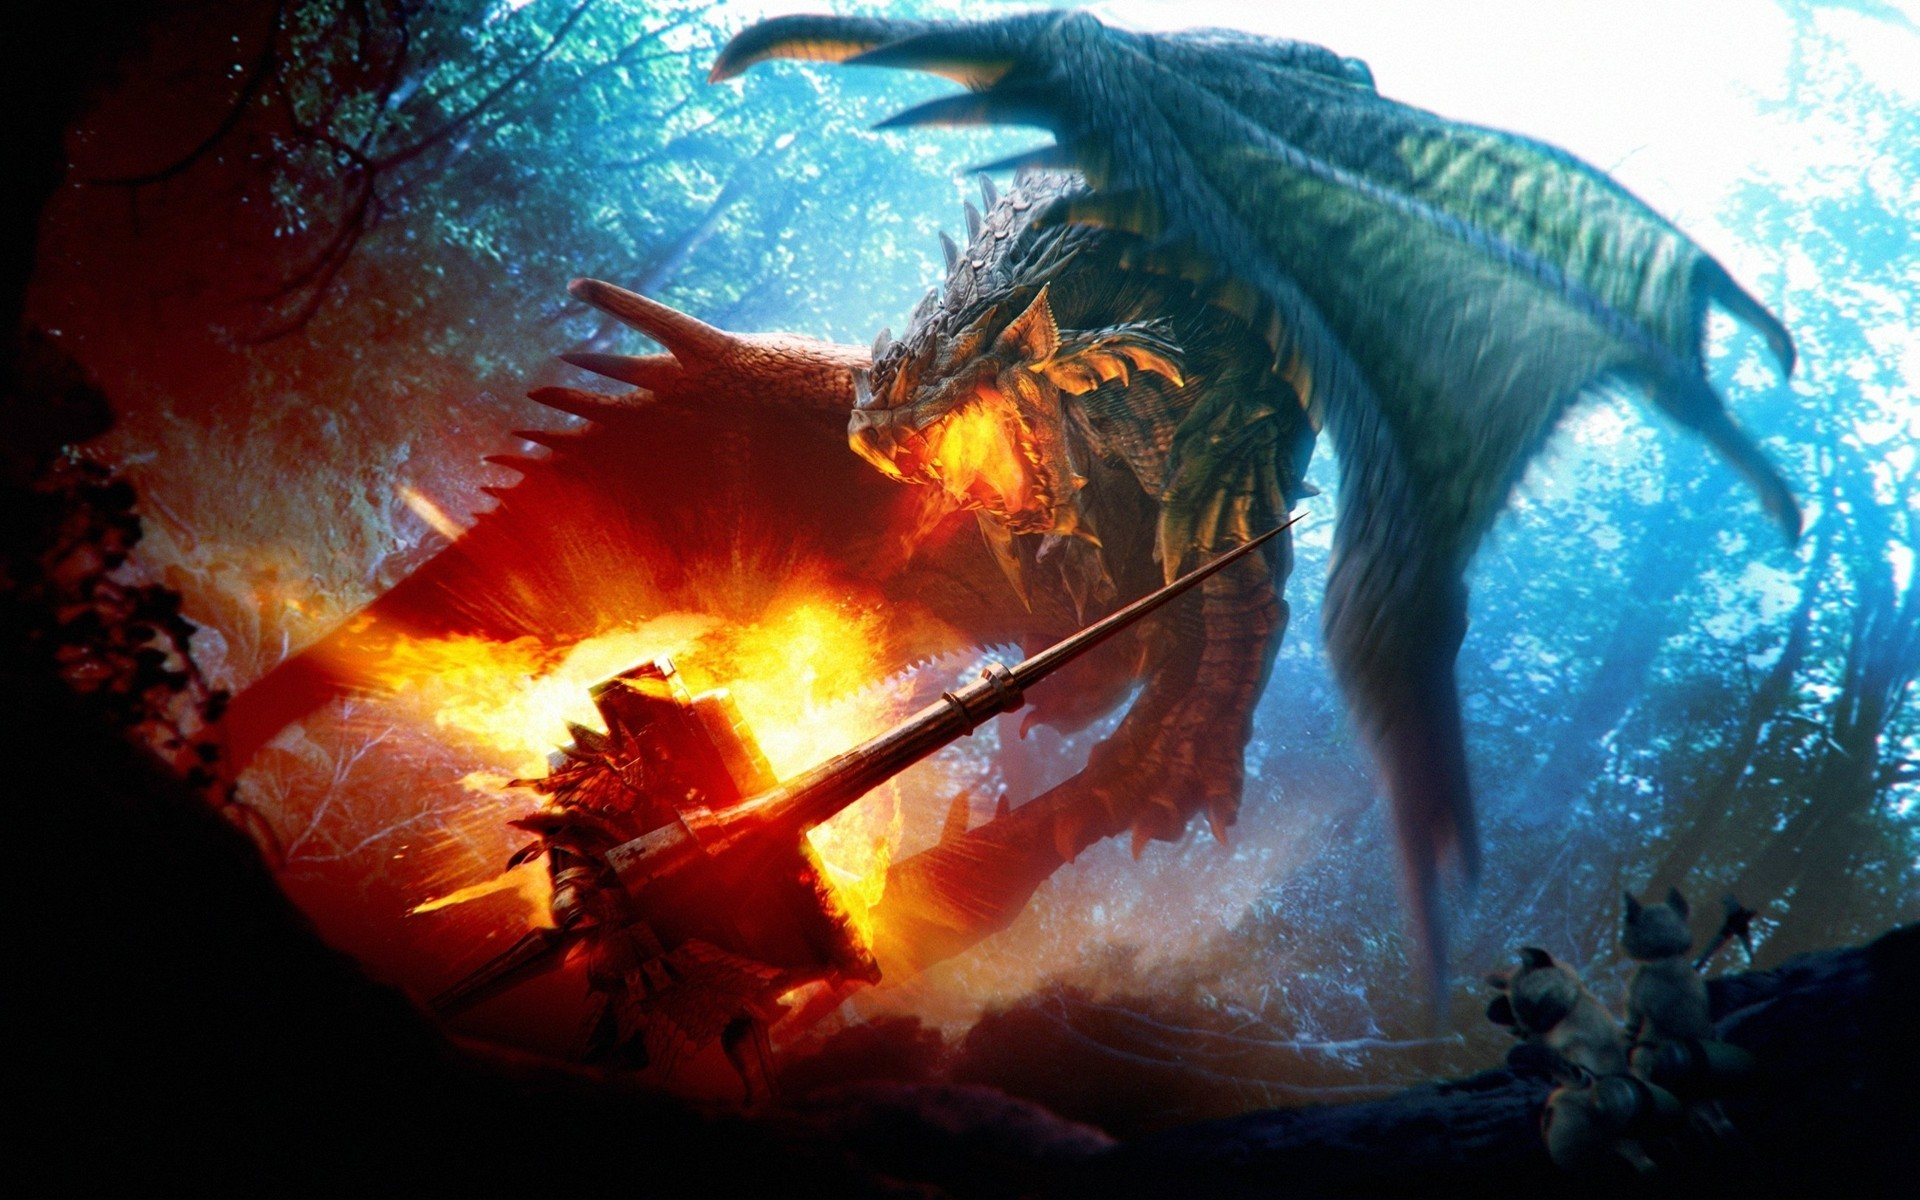 imagenes de dragones | Fire breathing dragon wallpaper #5177